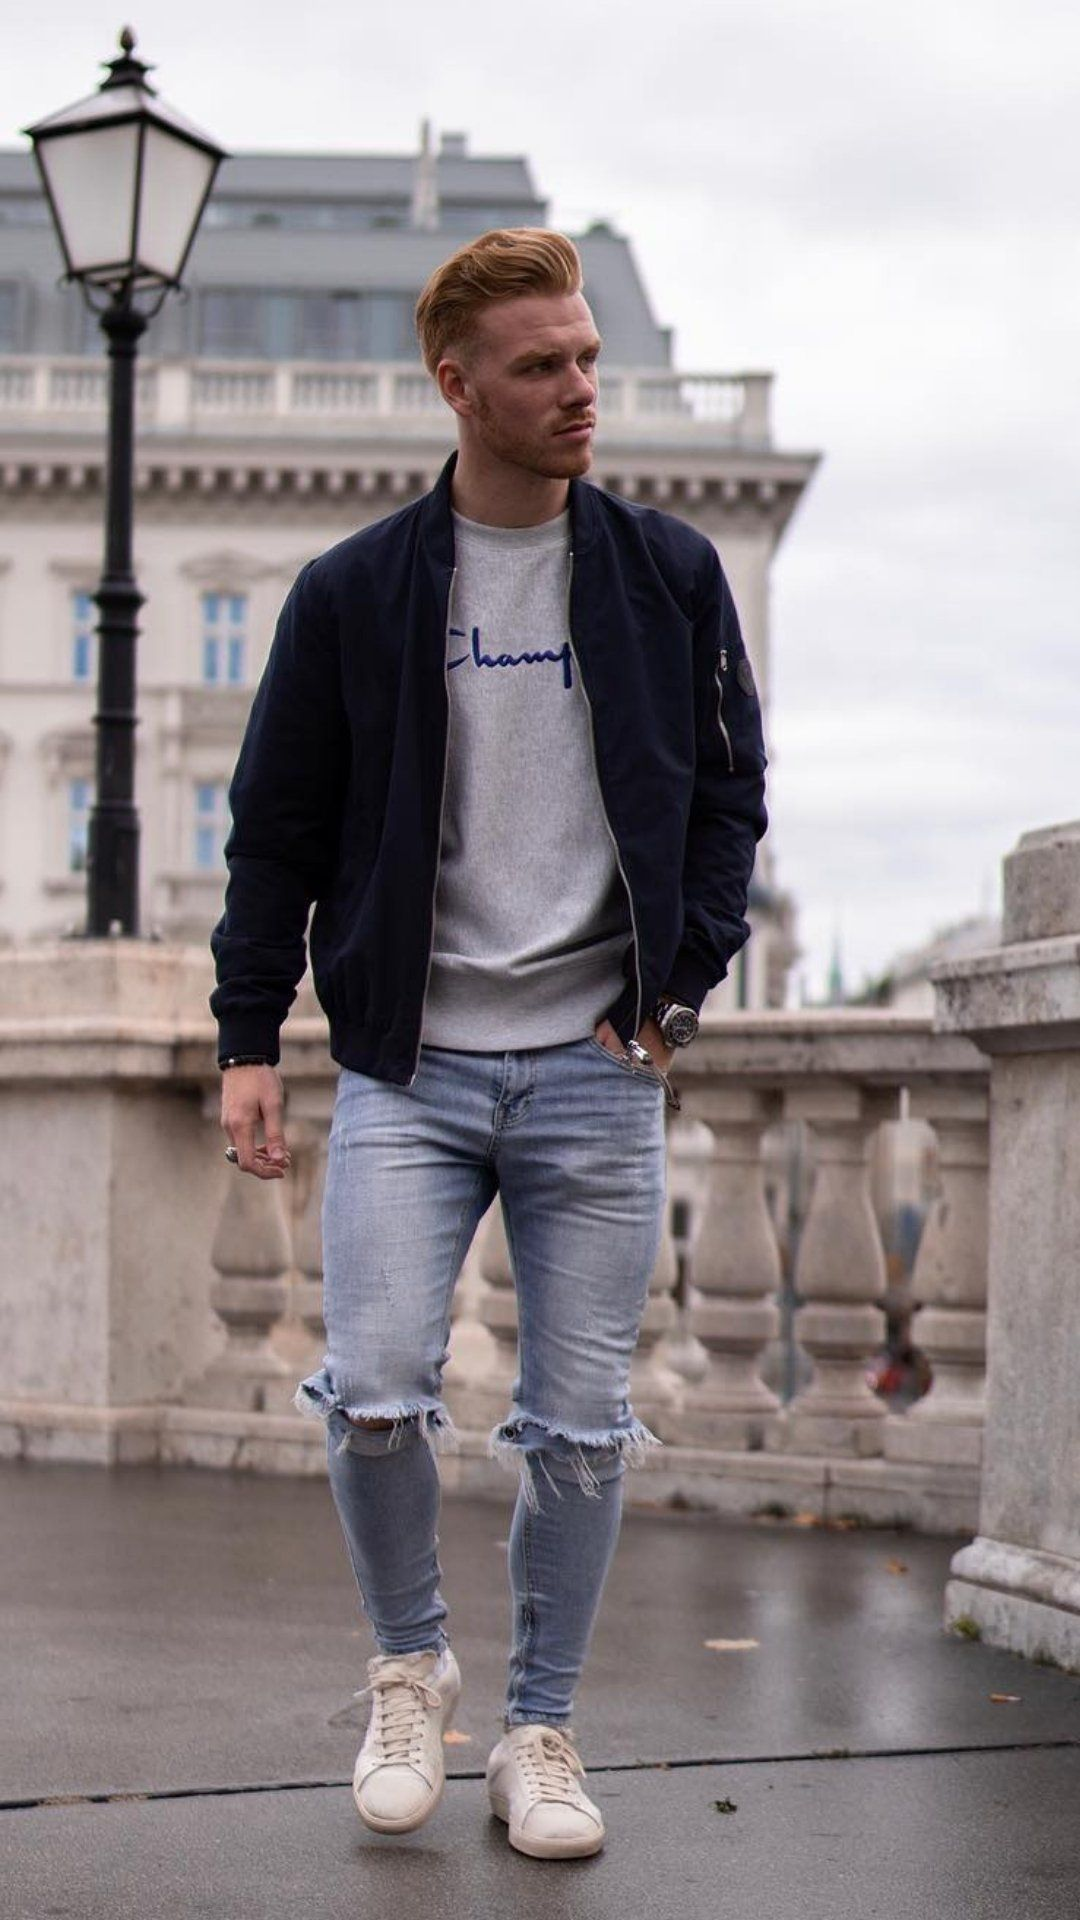 zerissene jeans bomber jacke